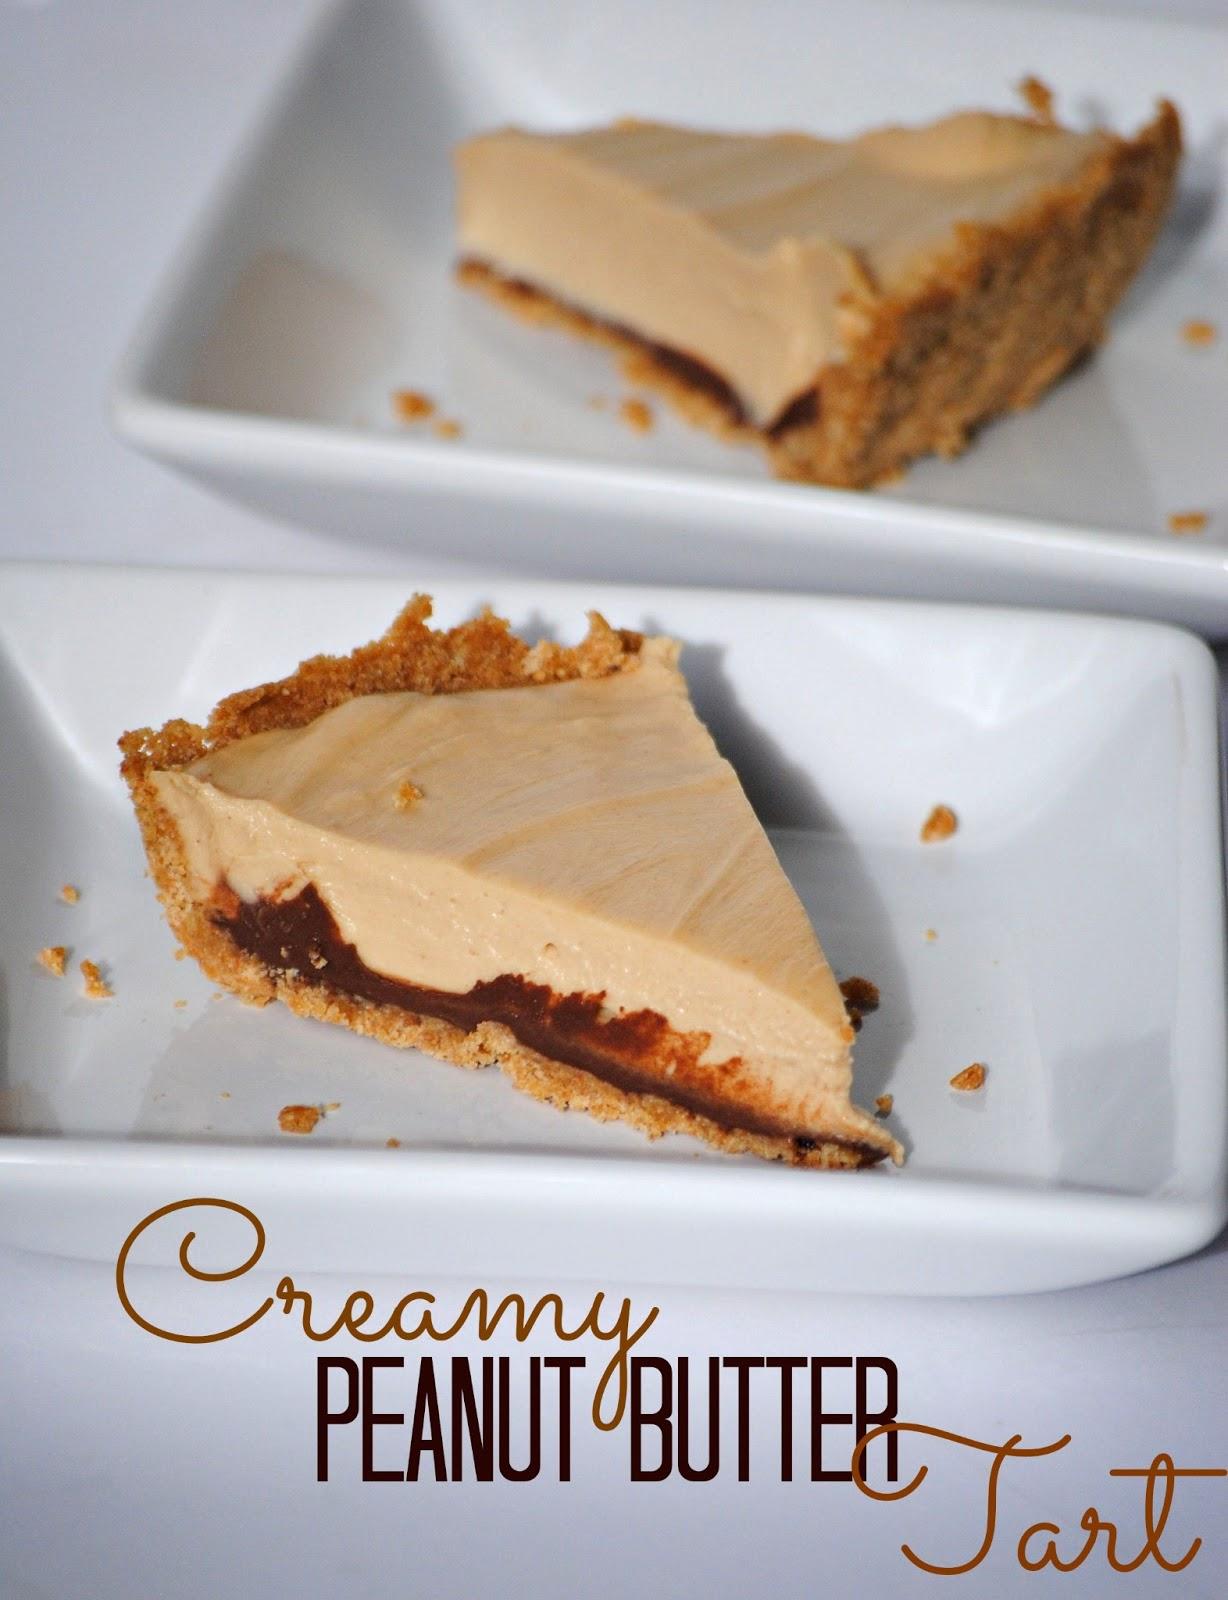 The Farm Girl Recipes: Creamy Peanut Butter Tart